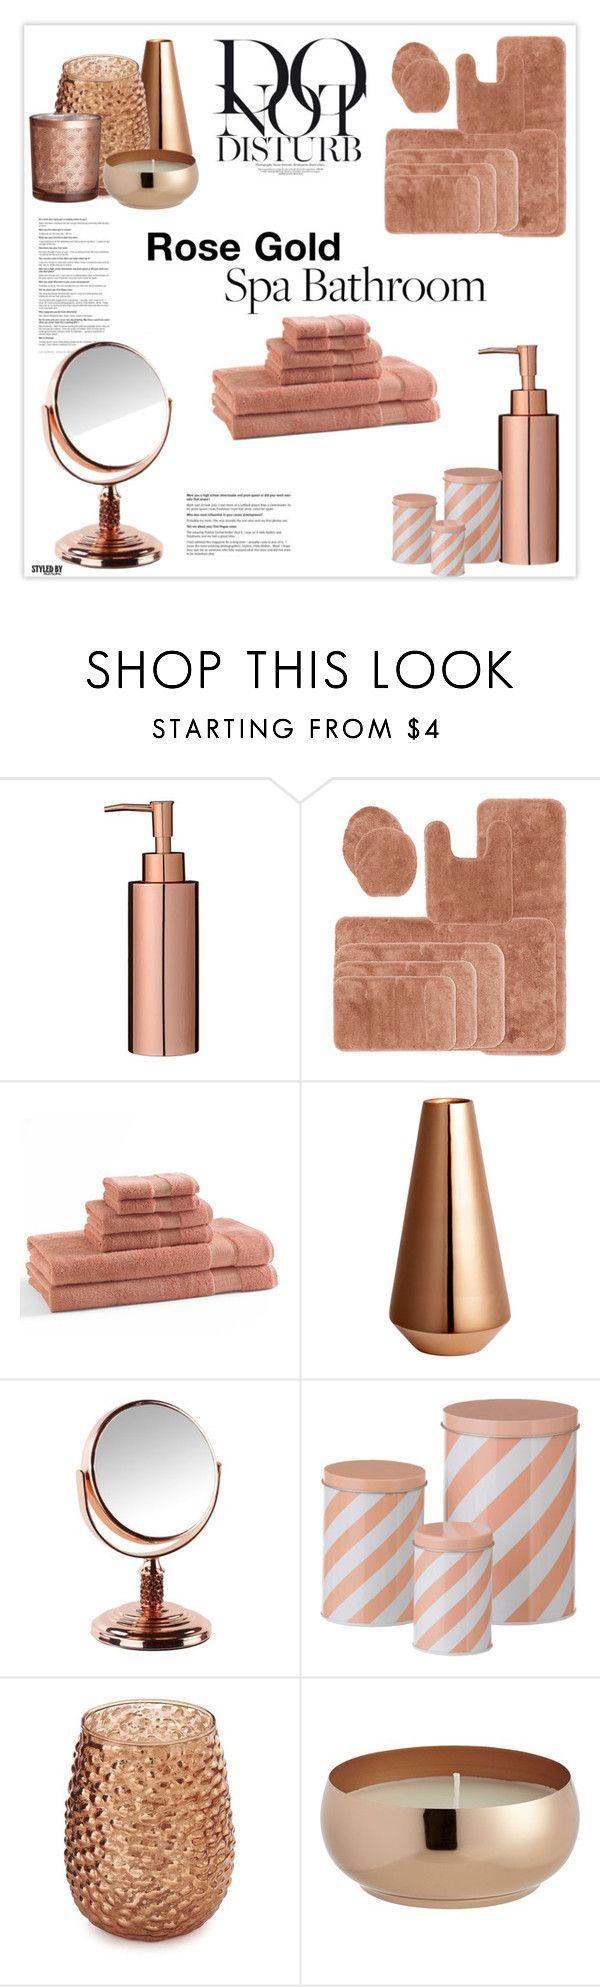 Rose Gold Bathroom Decor By Marion Fashionista Diva Miller